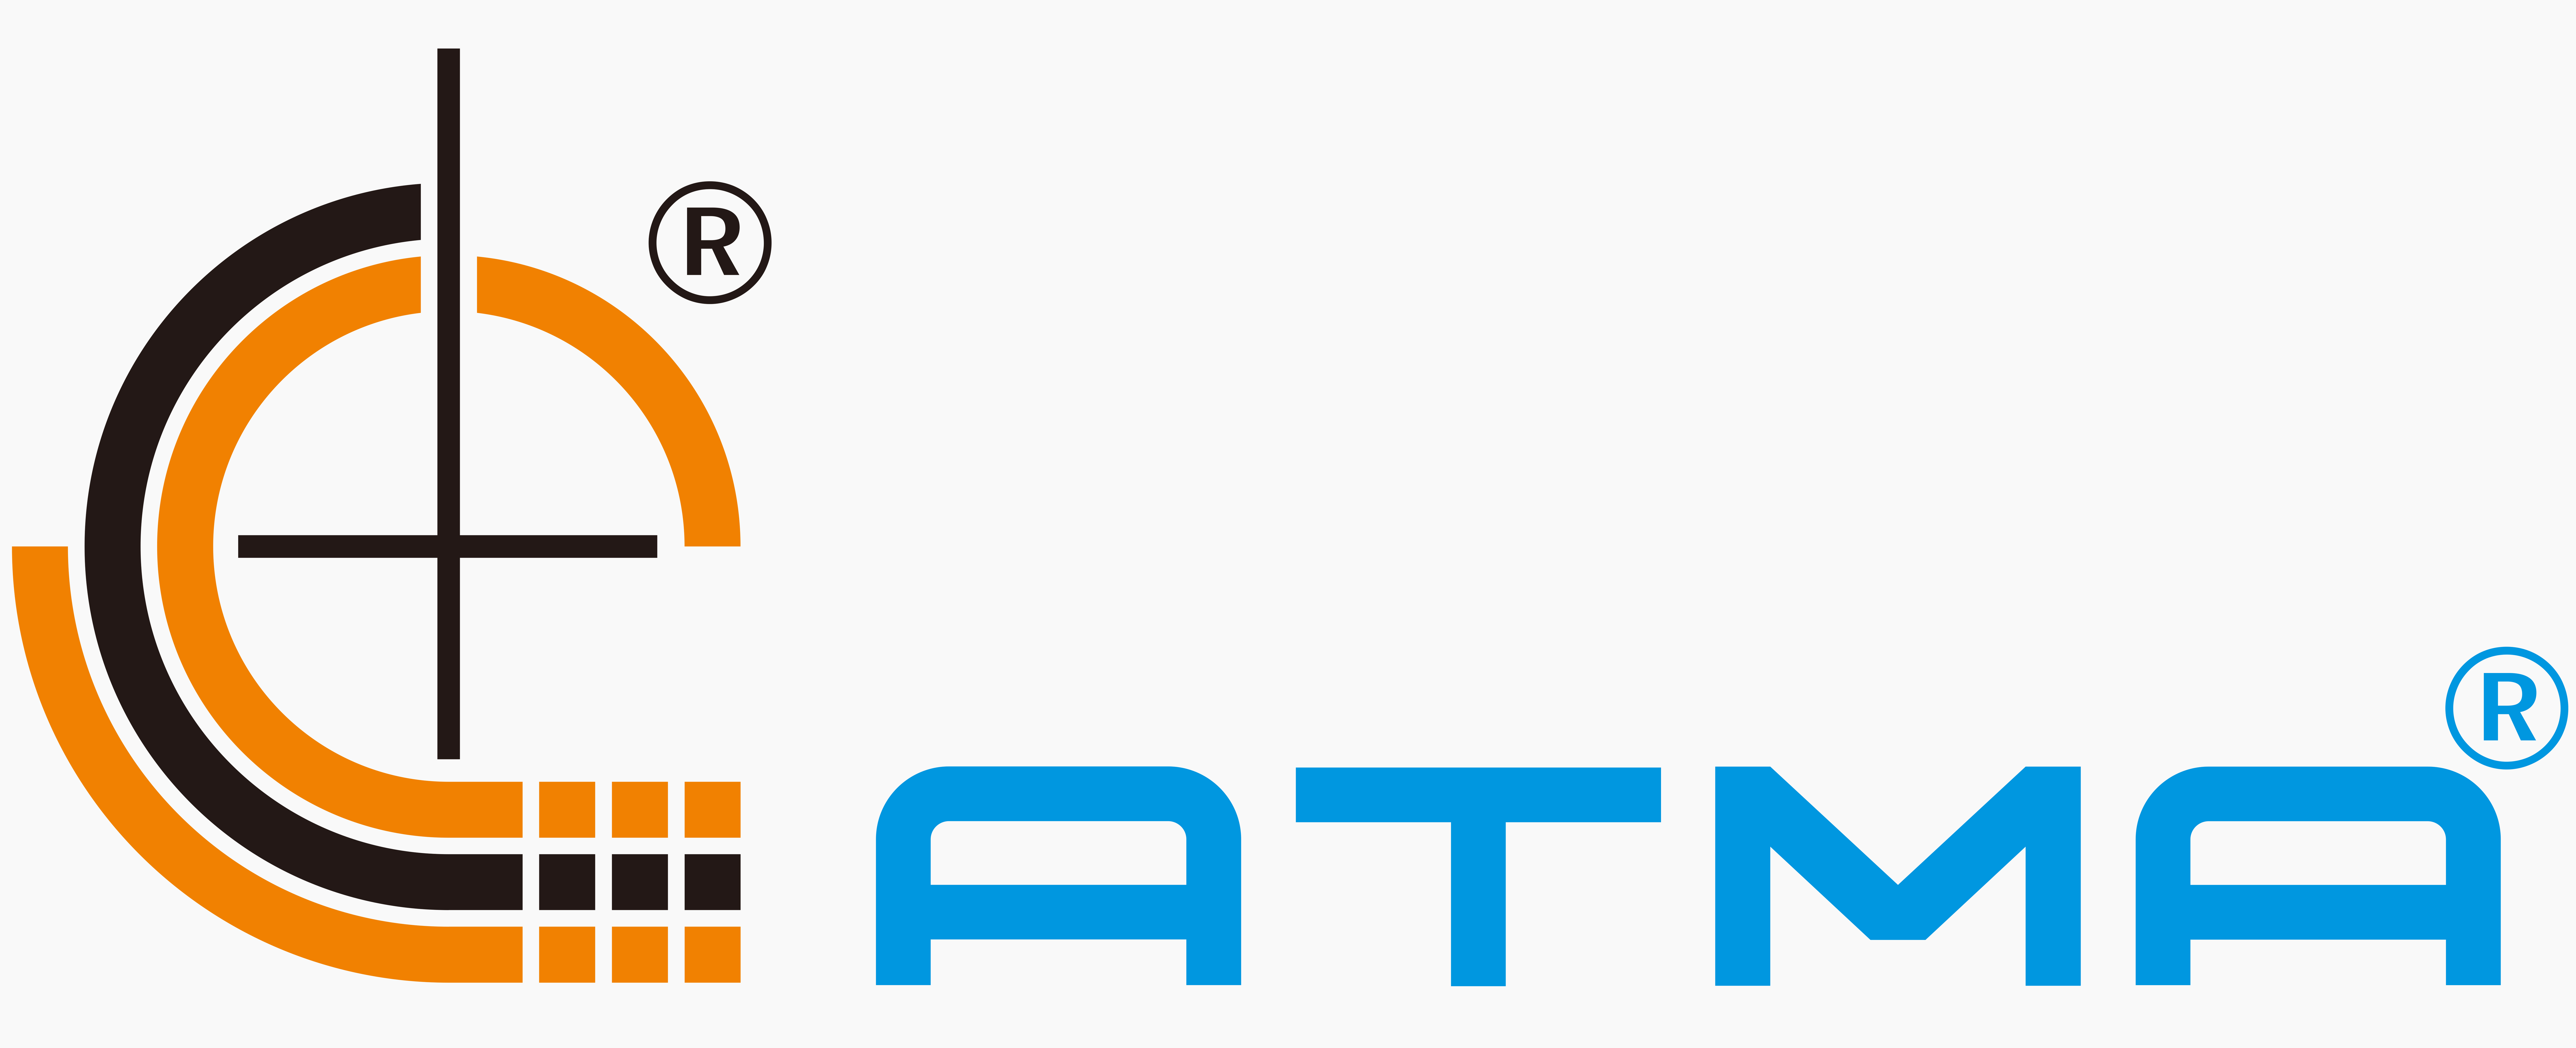 ATMA代表高级台湾或东元机械自动化。